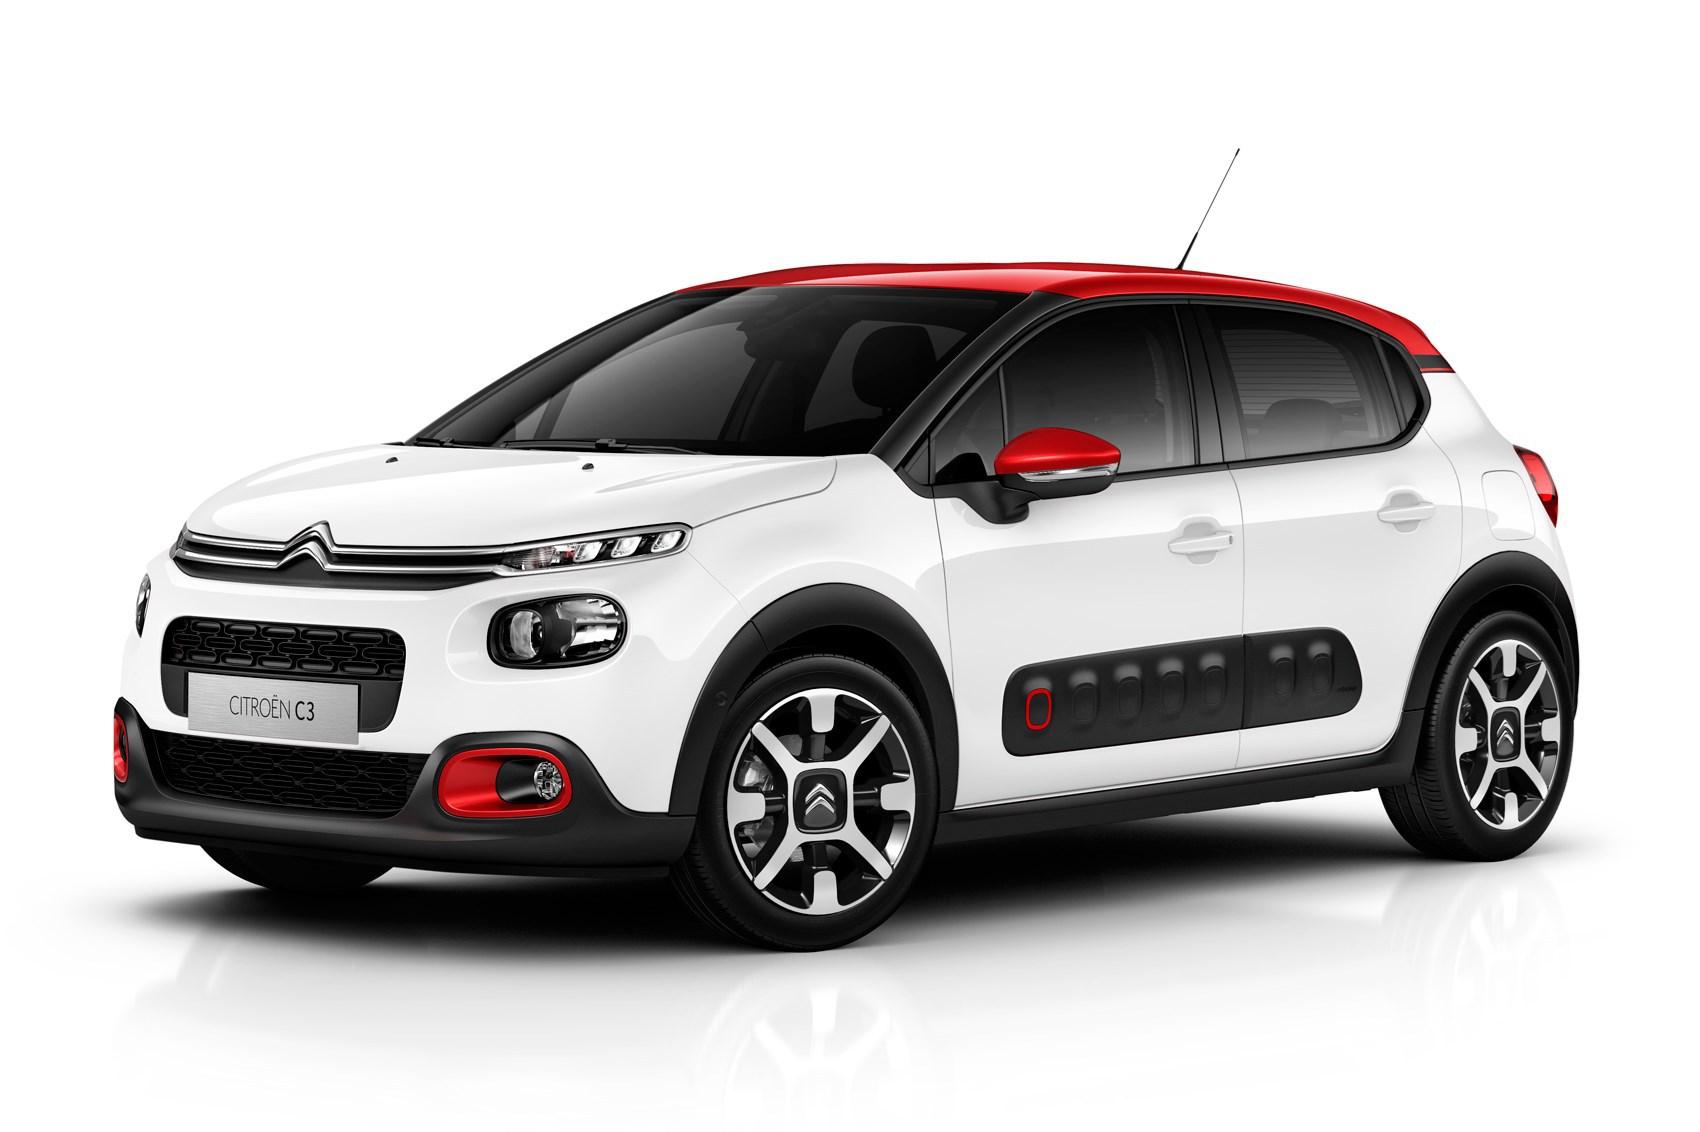 Accesorios Citroën New C3